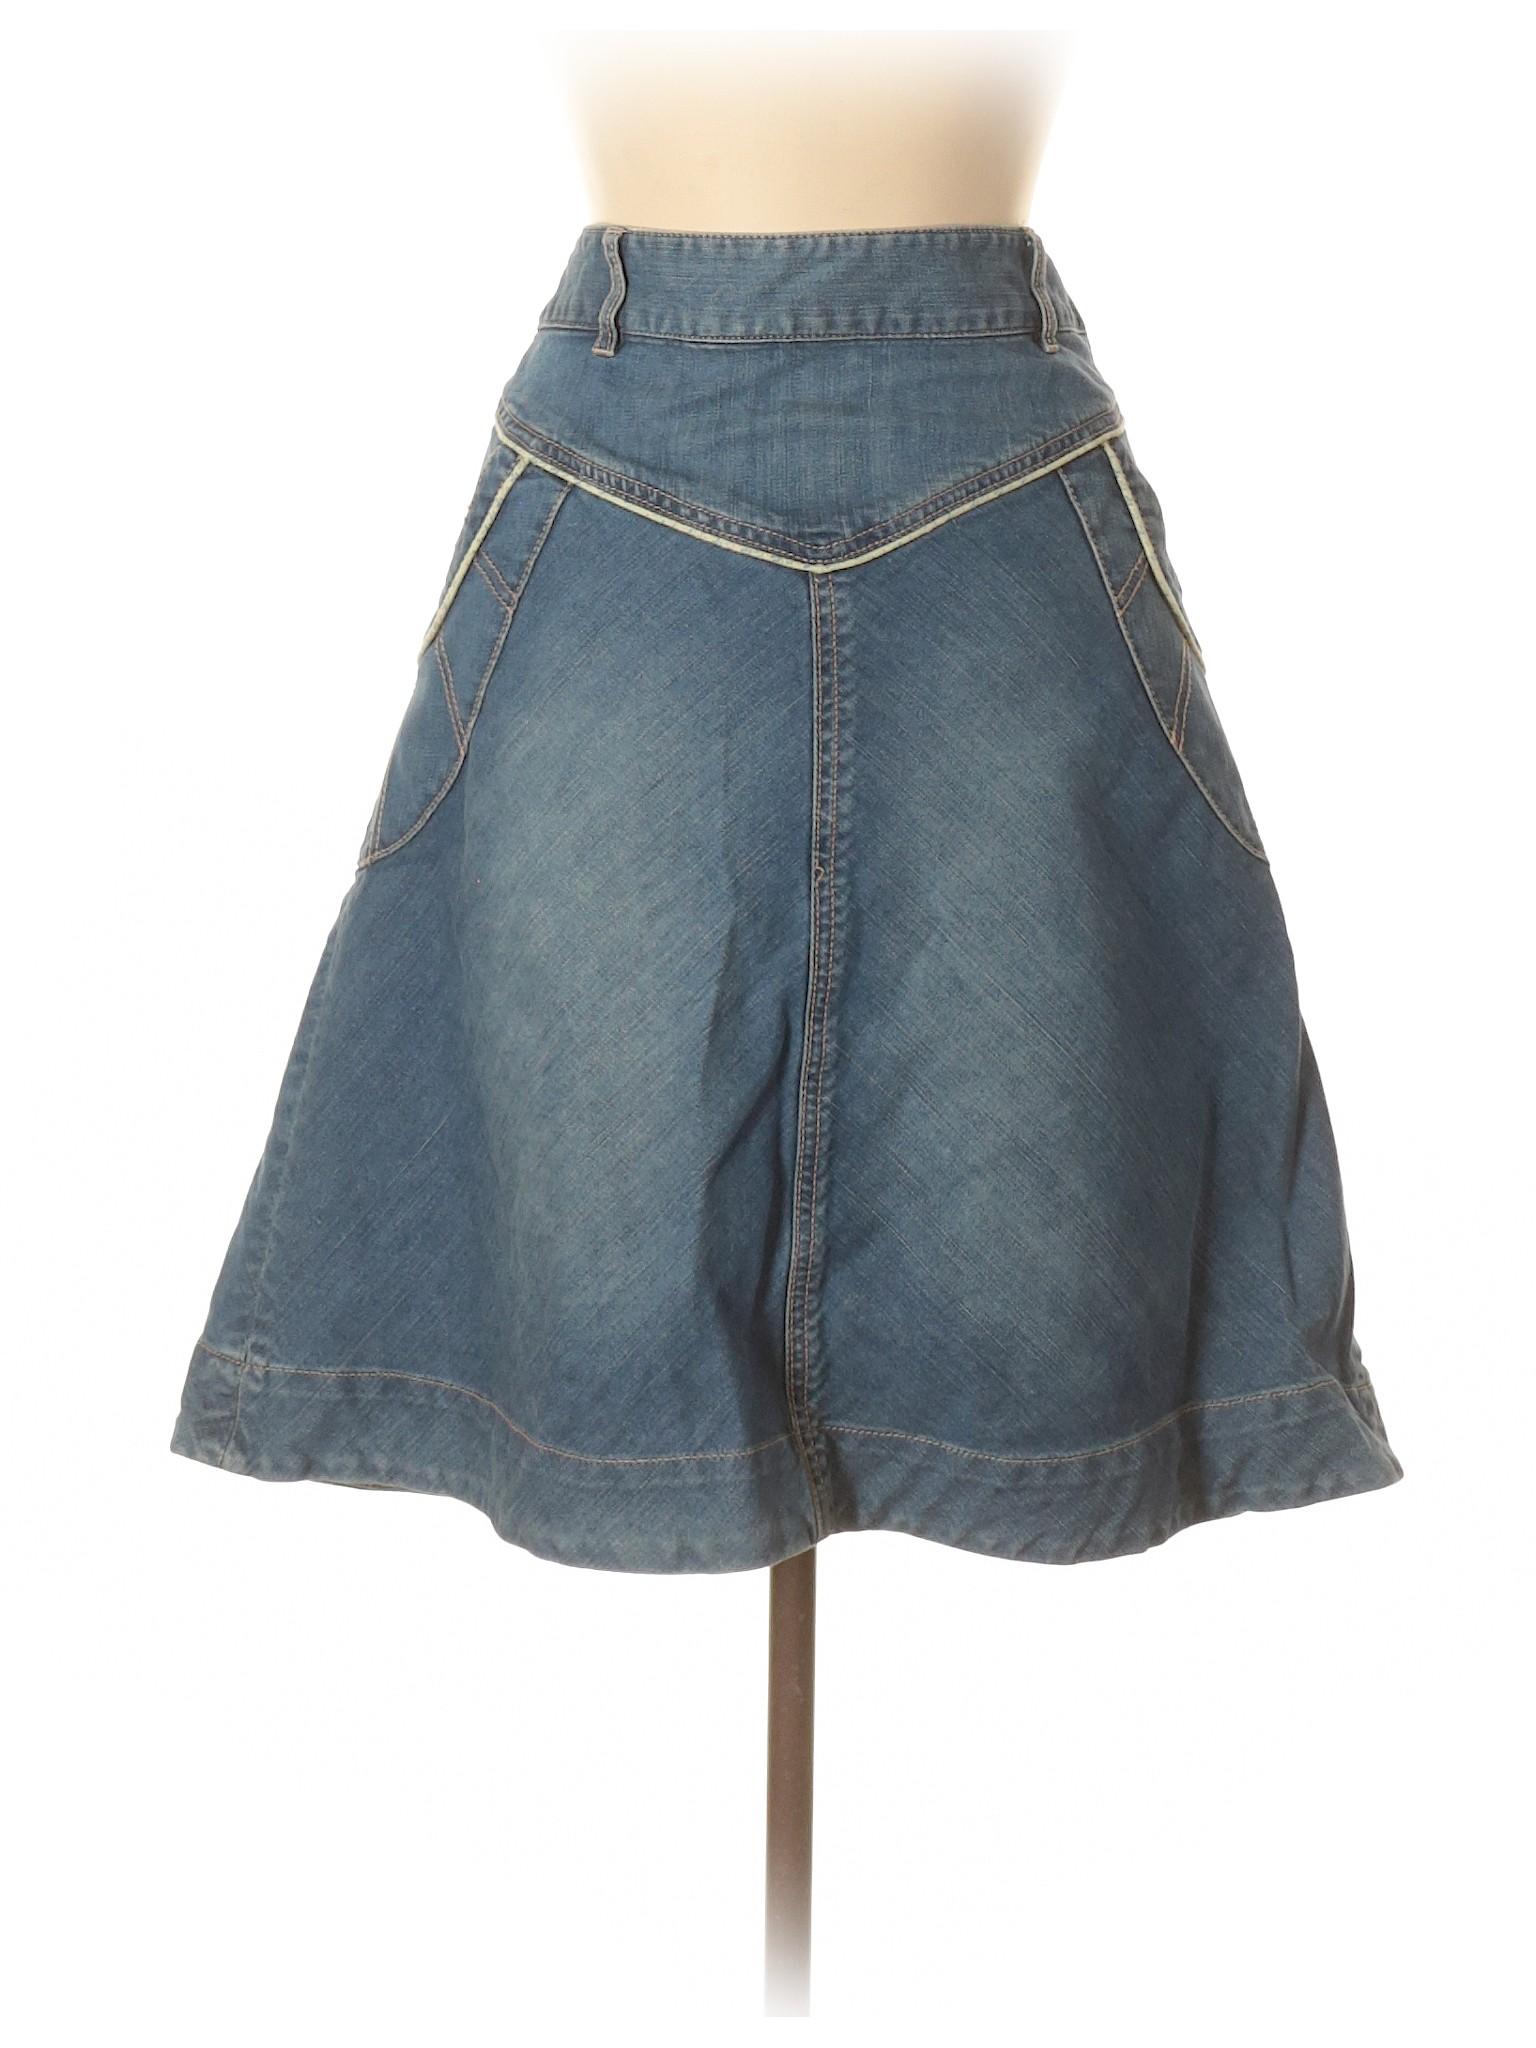 Skirt Boutique Denim Boutique Skirt Denim Denim Skirt Boutique BgtxRXnqRw